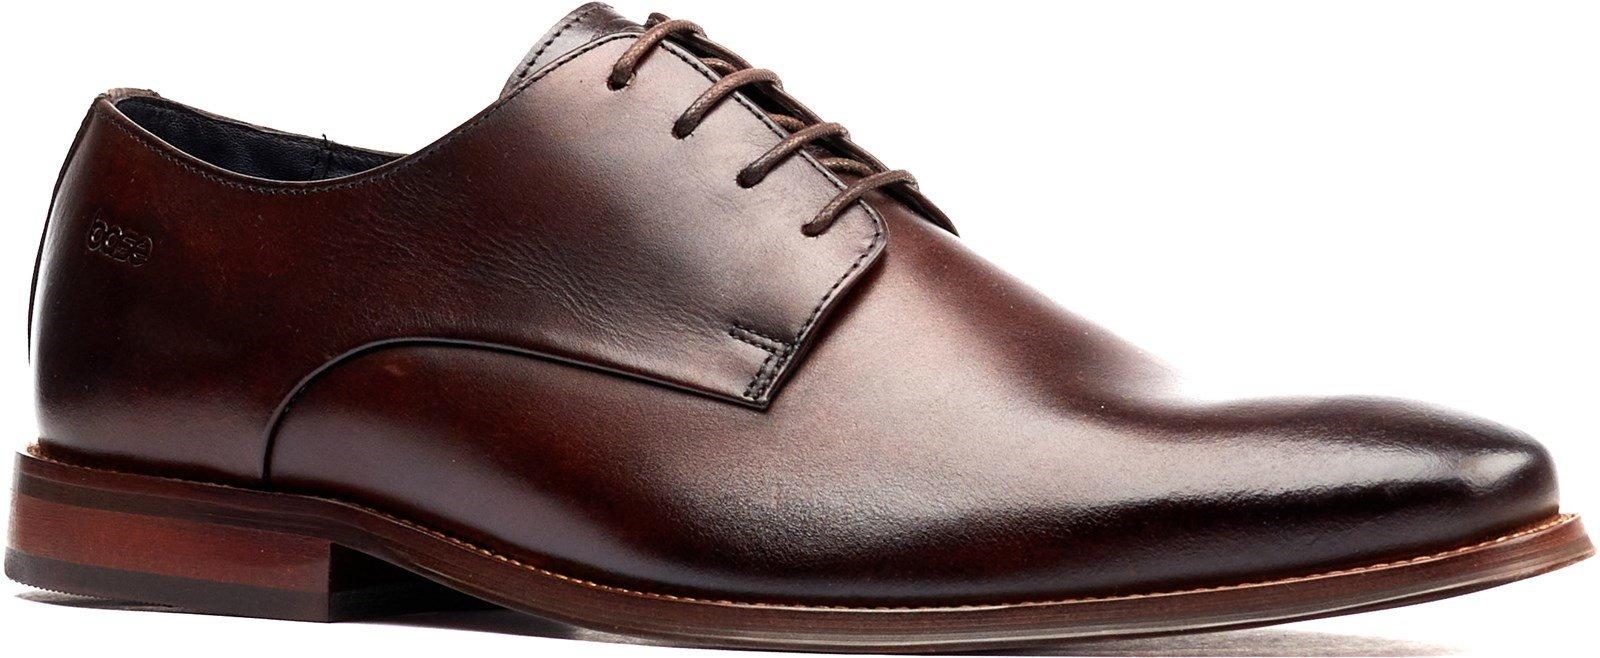 Base London Men's Marley Plain Toe Derby Shoe Brown 32250 - Brown 6